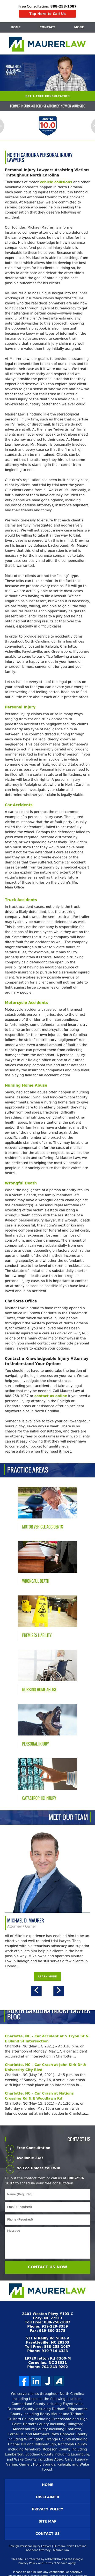 Maurer Law | Raleigh NC Law | LawyerLand